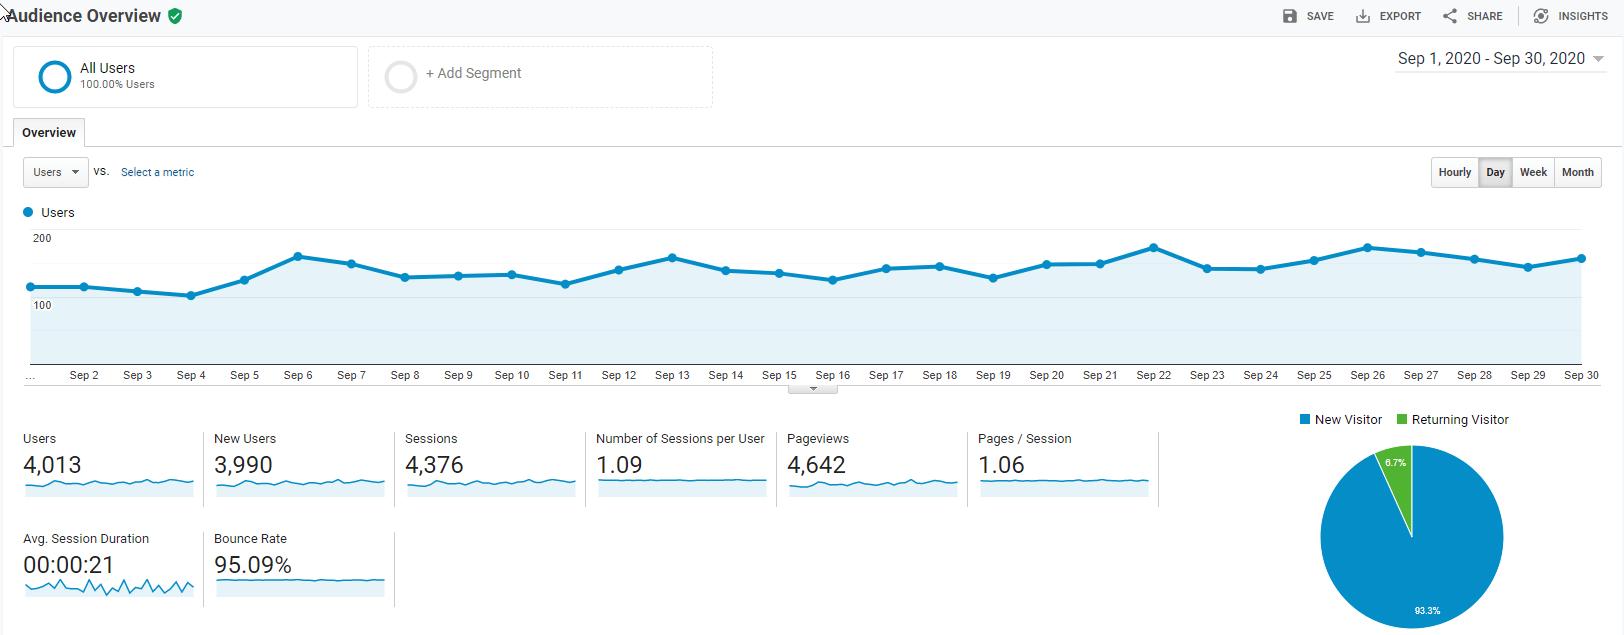 Google Analytics - Sept 2020